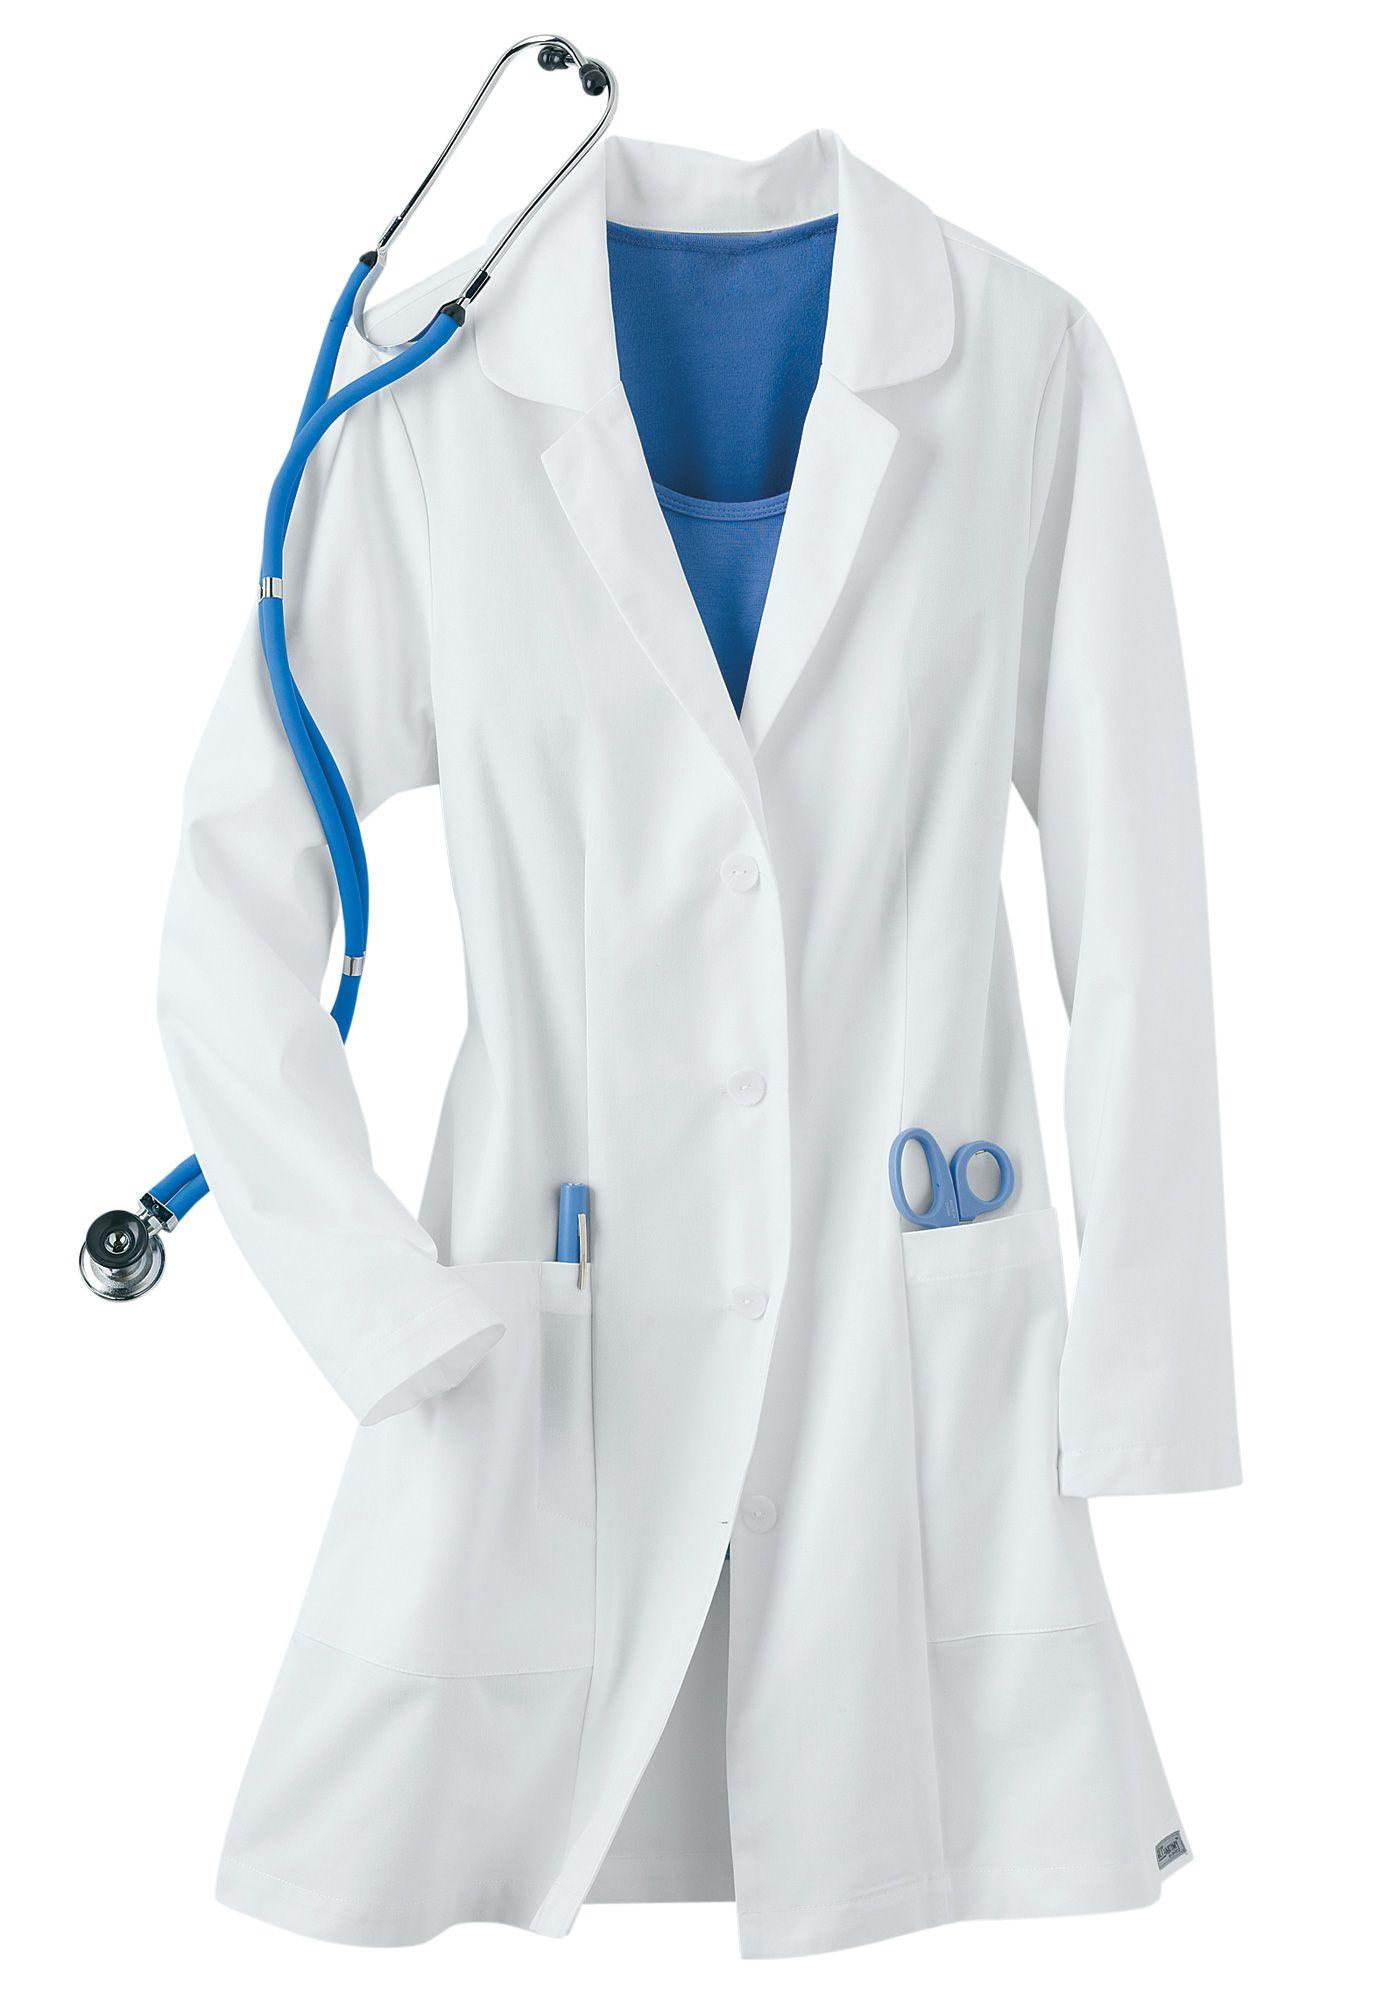 Greys Anatomy Signature Soft Stretch Lab Coat w tablet pocket